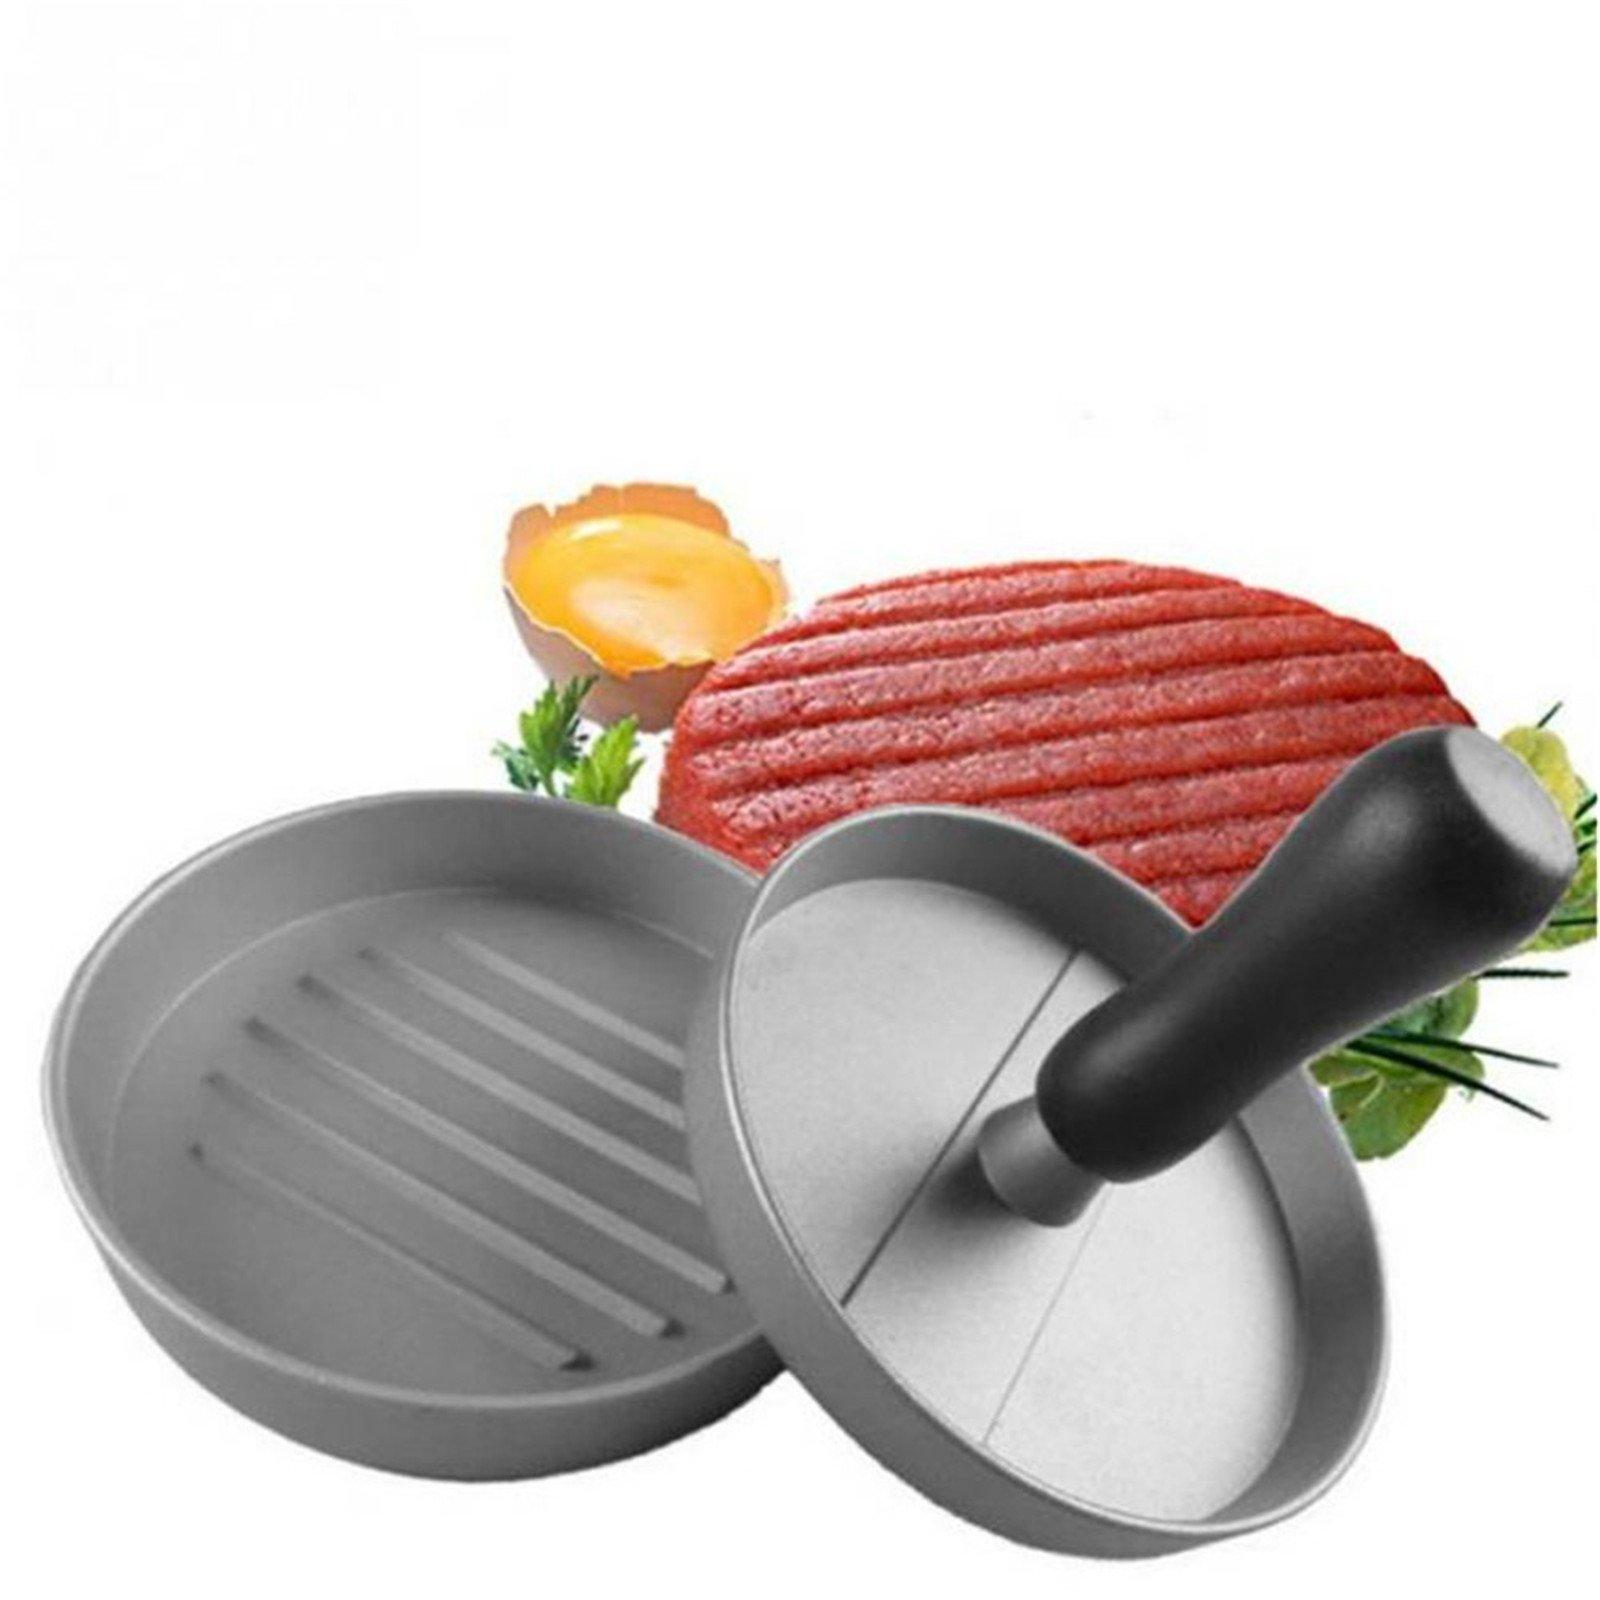 VALINK Burger Press, Hamburger Maker, Non Stick Patties Mold, Pancake Mold, Grill BBQ Patty Maker, Roast Meat Press Cookware Kitchen Dining Bar Tool